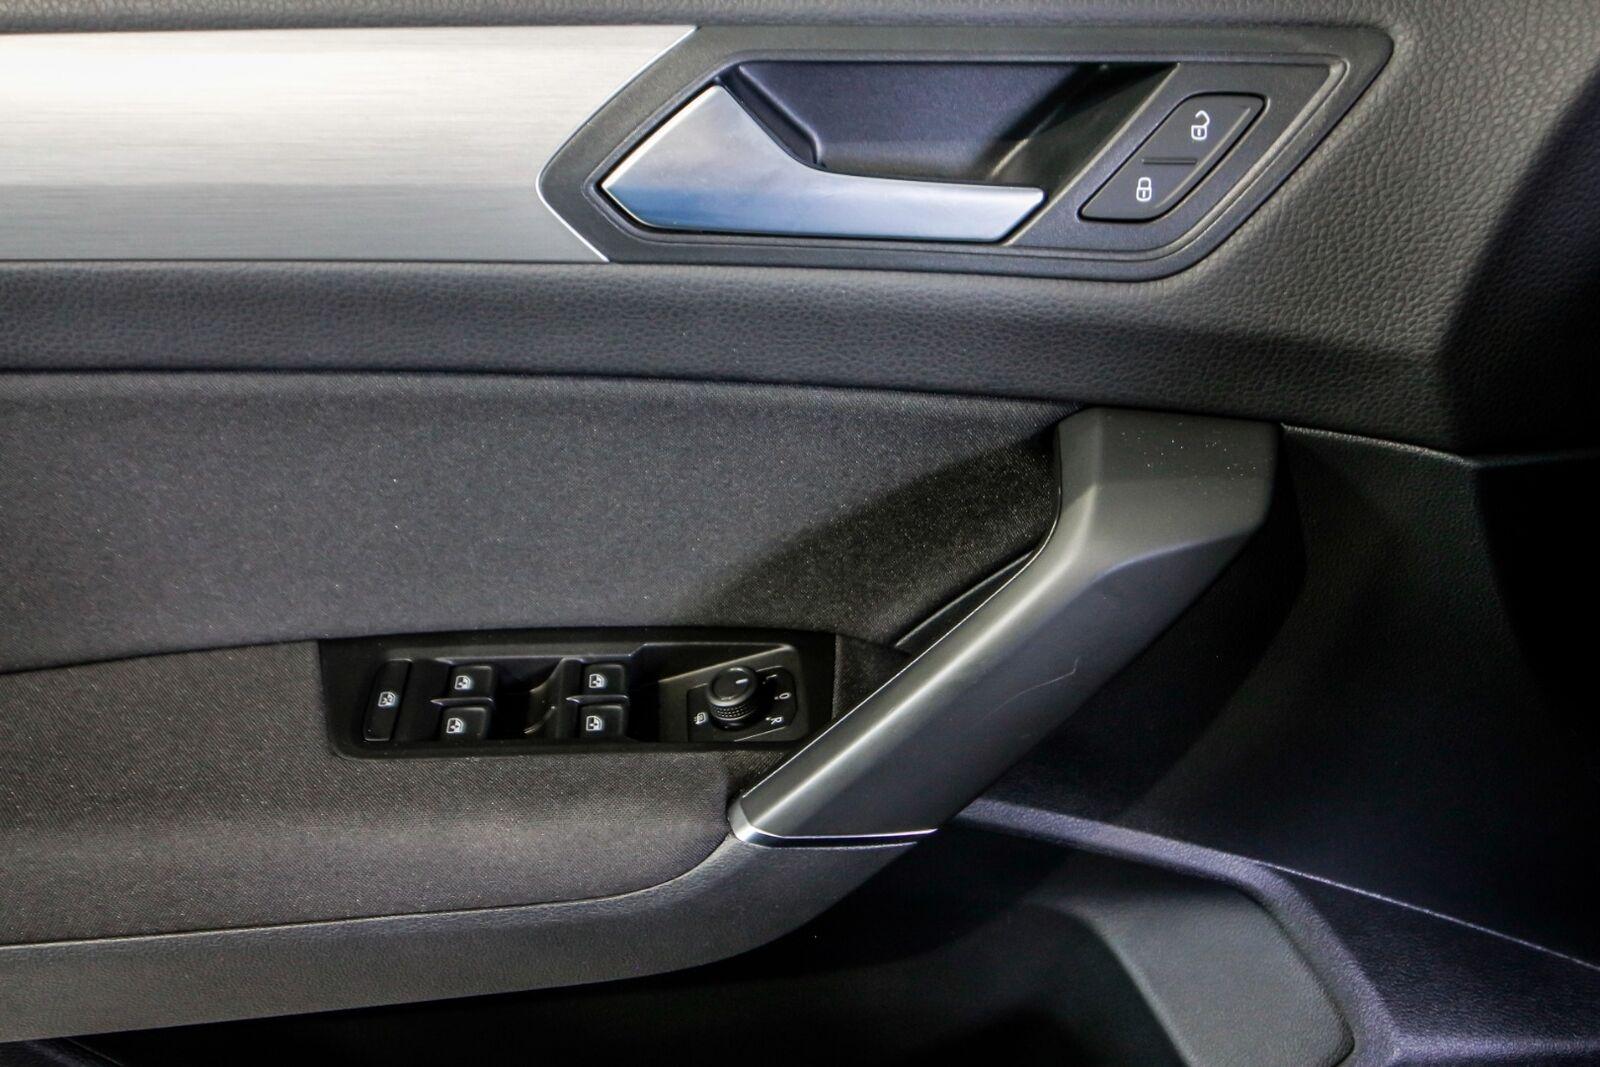 VW Touran 2018